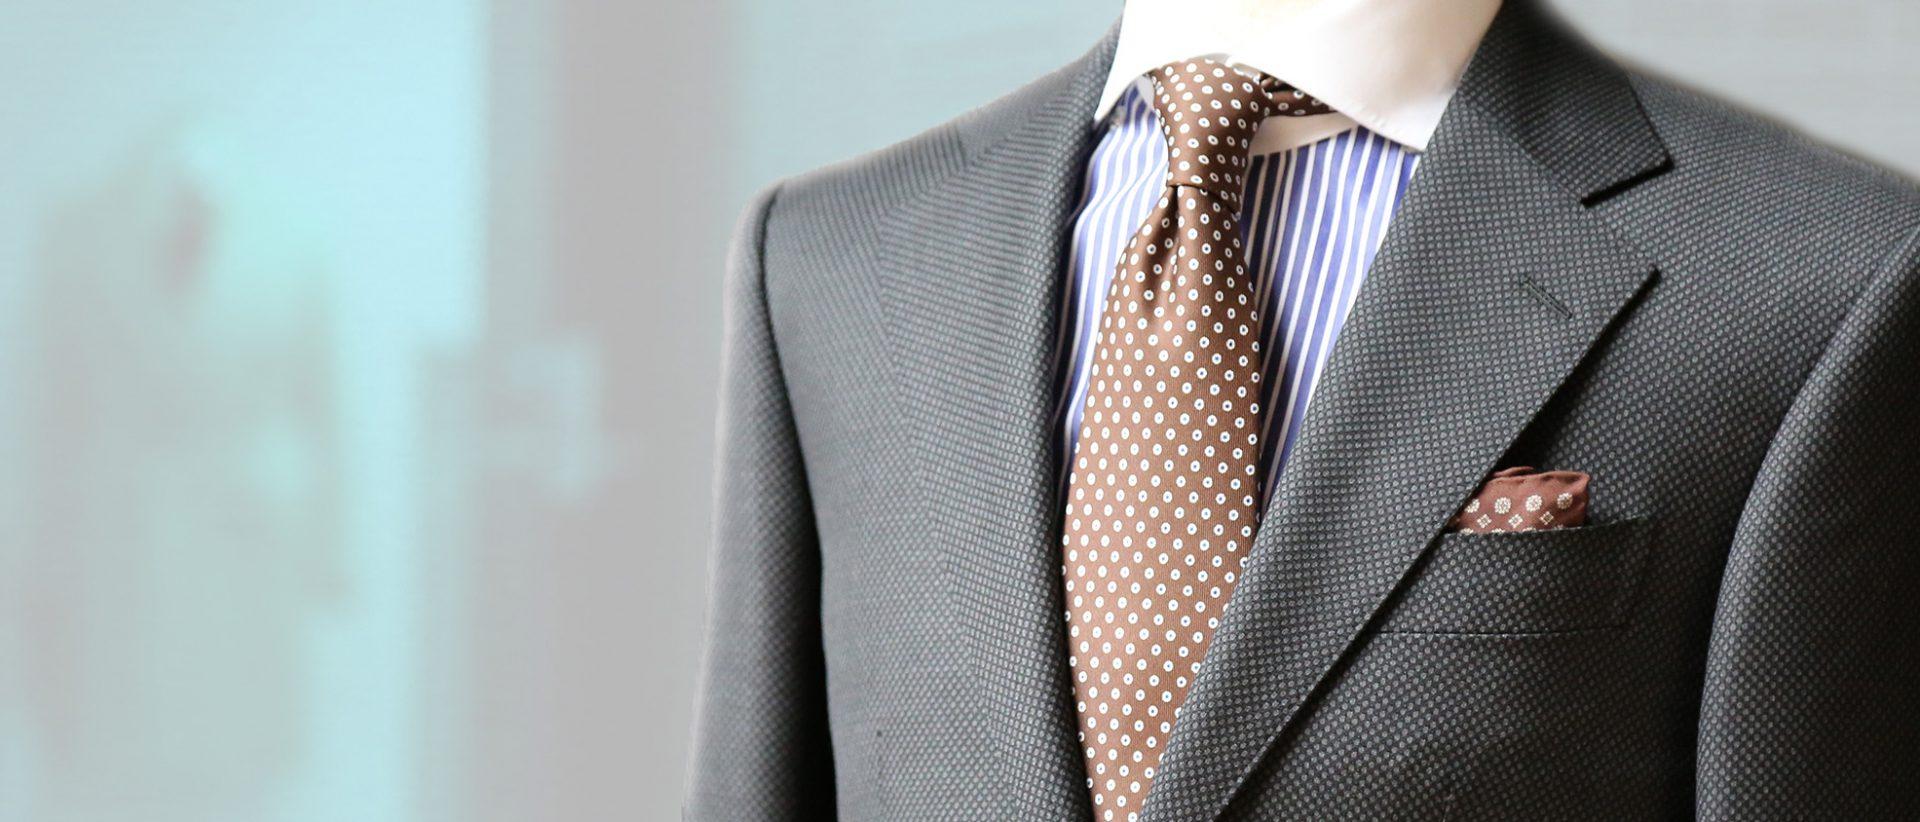 Kravaty s vysokou estetickou vyrovnanosťou, svetovou úrovňou a nadčasovím dizajnom.